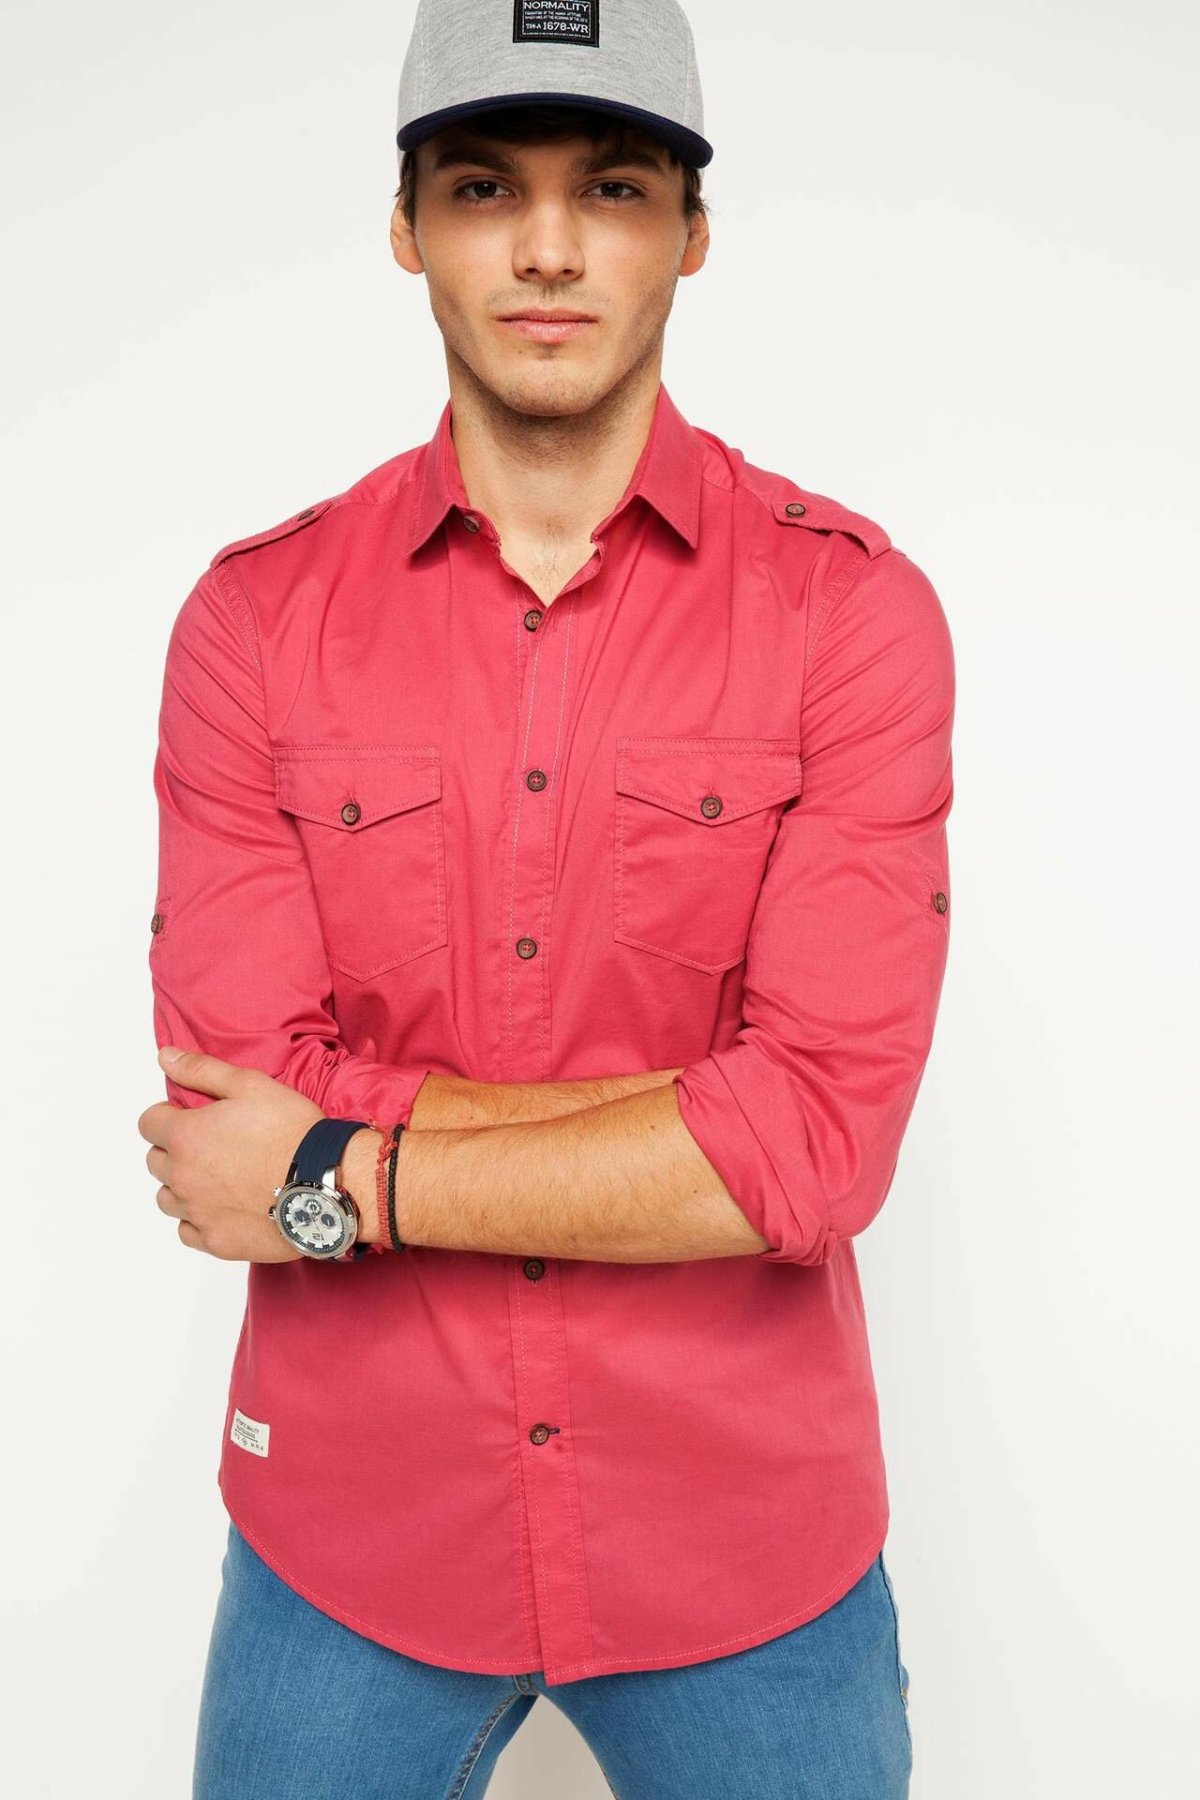 DeFacto Man Summer Breathable Smart Casual Shirts Men Solid Color Long Sleeve Top Shirt Men Cotton Top Shirts-G5645AZ17SM